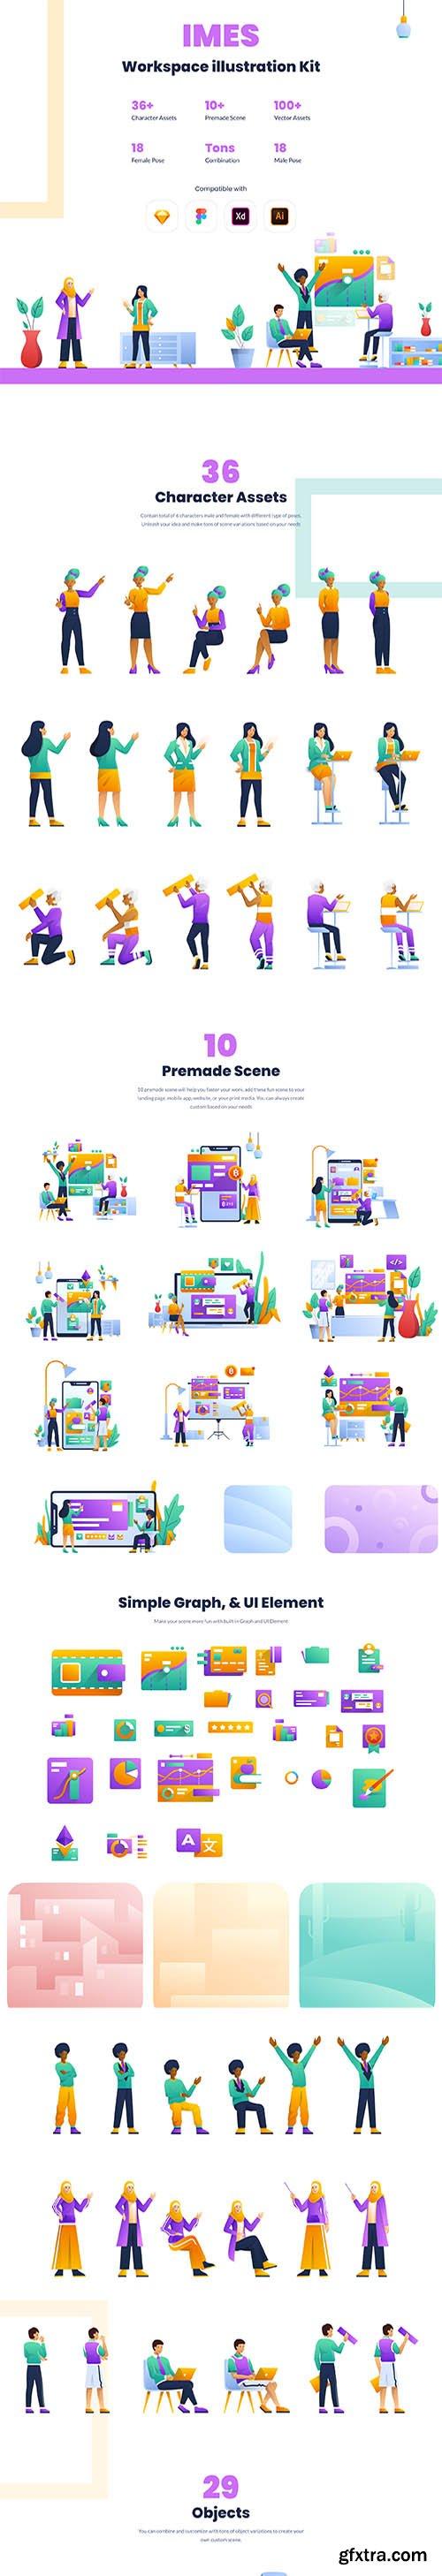 IMES Workspace Illustration Set